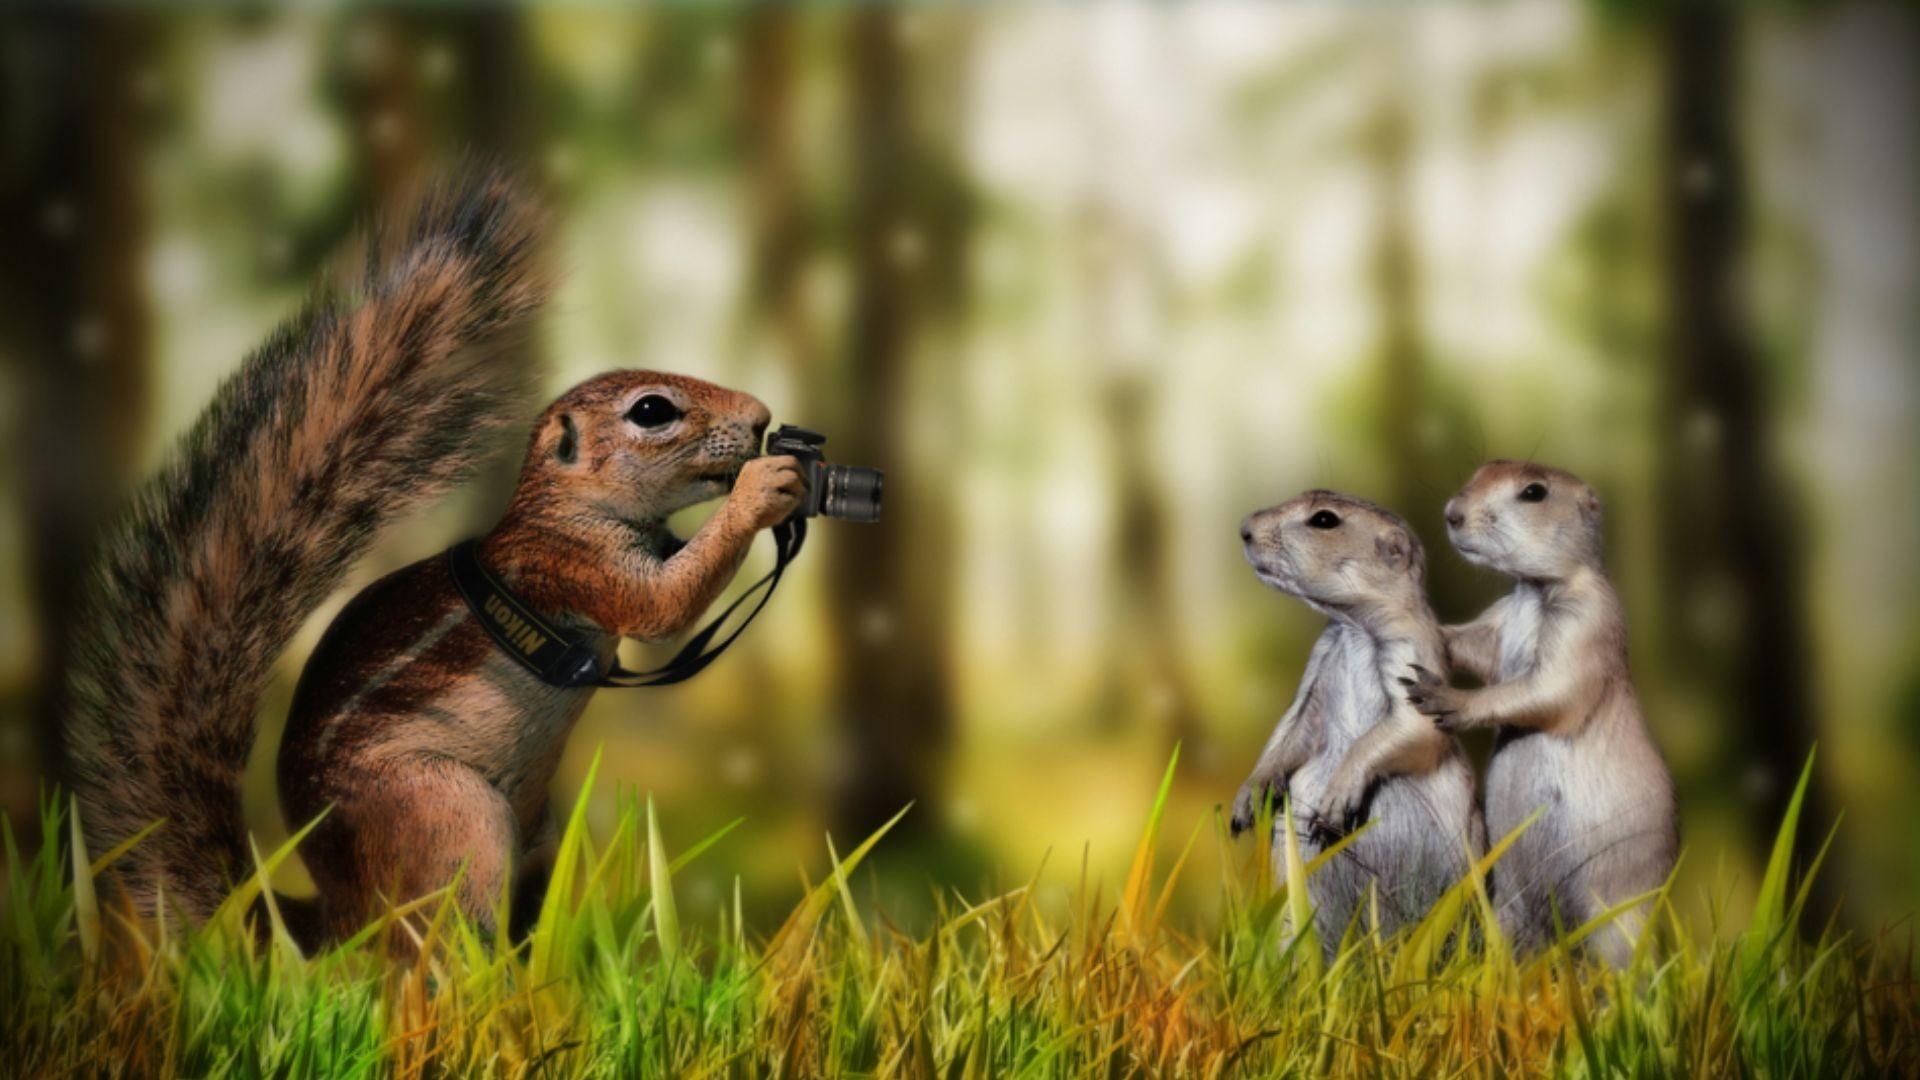 Animal · Funny Animal Wallpaper …